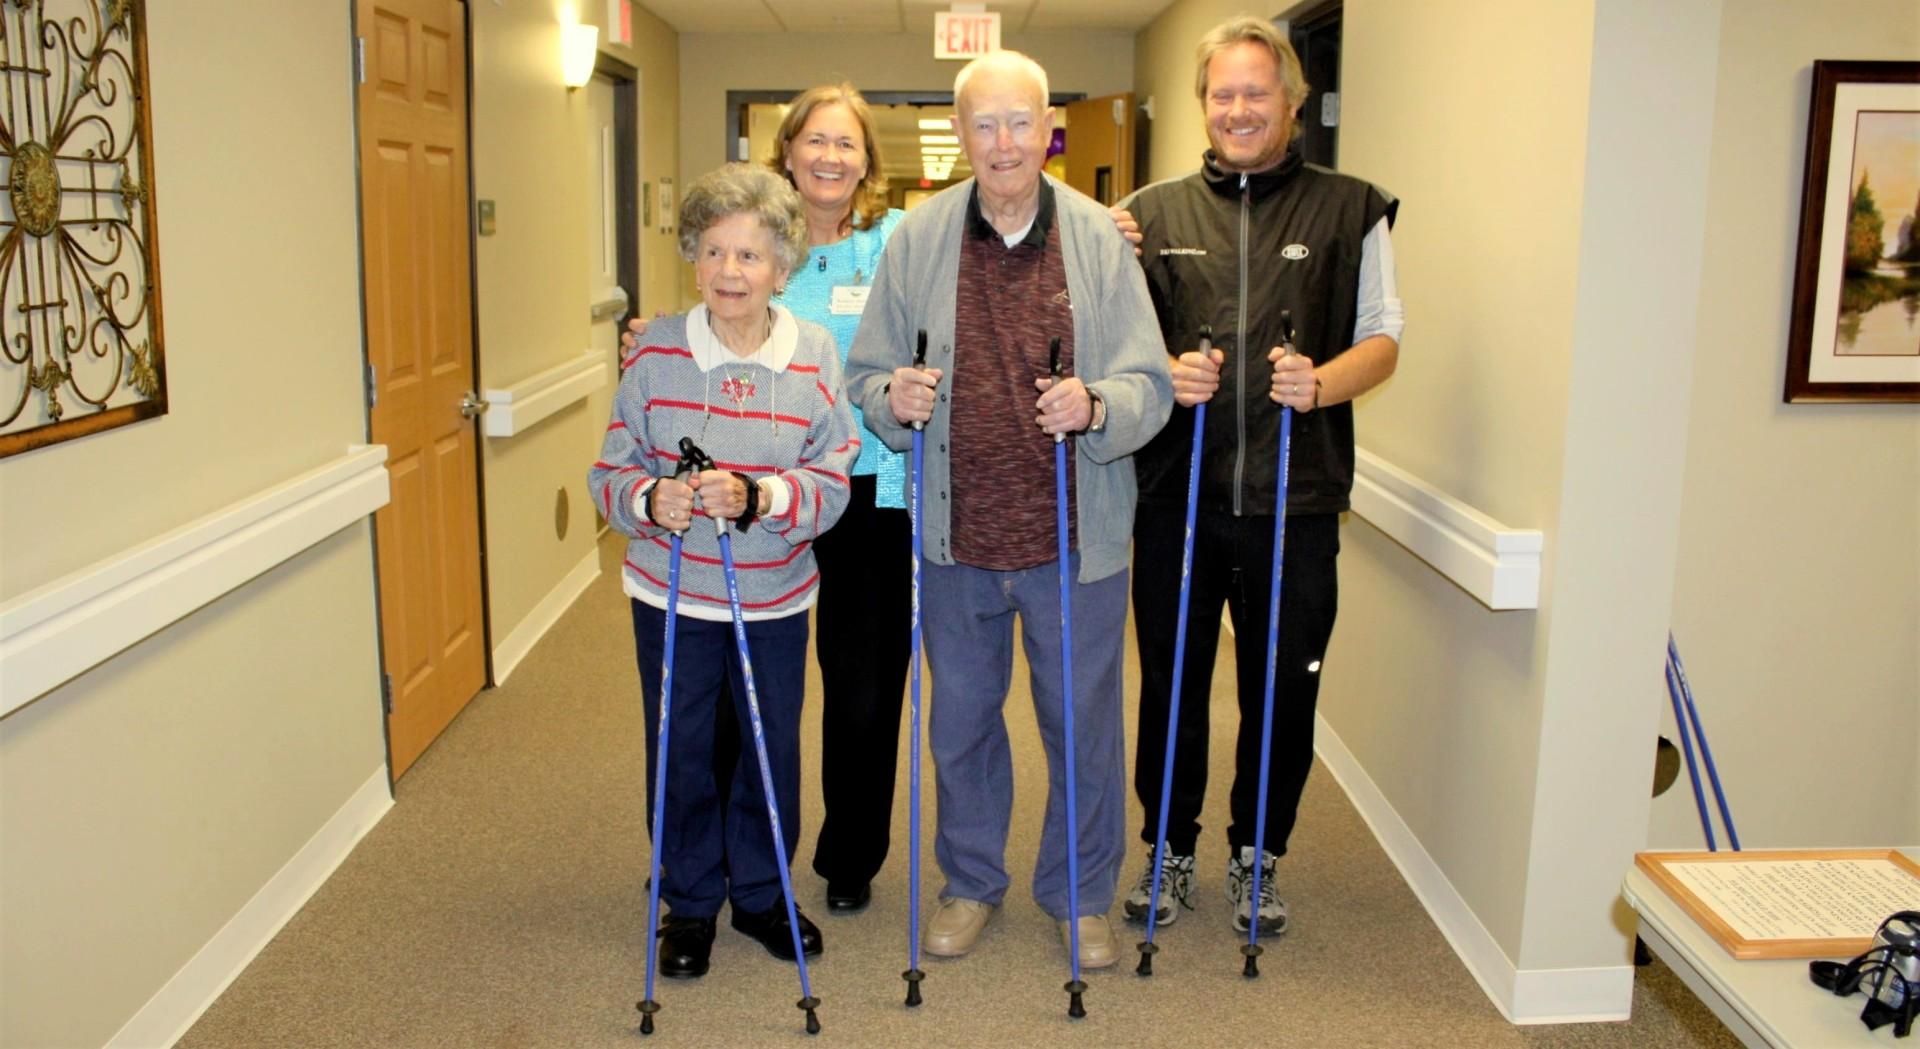 SWIX Nordic Walking Poles For Seniors